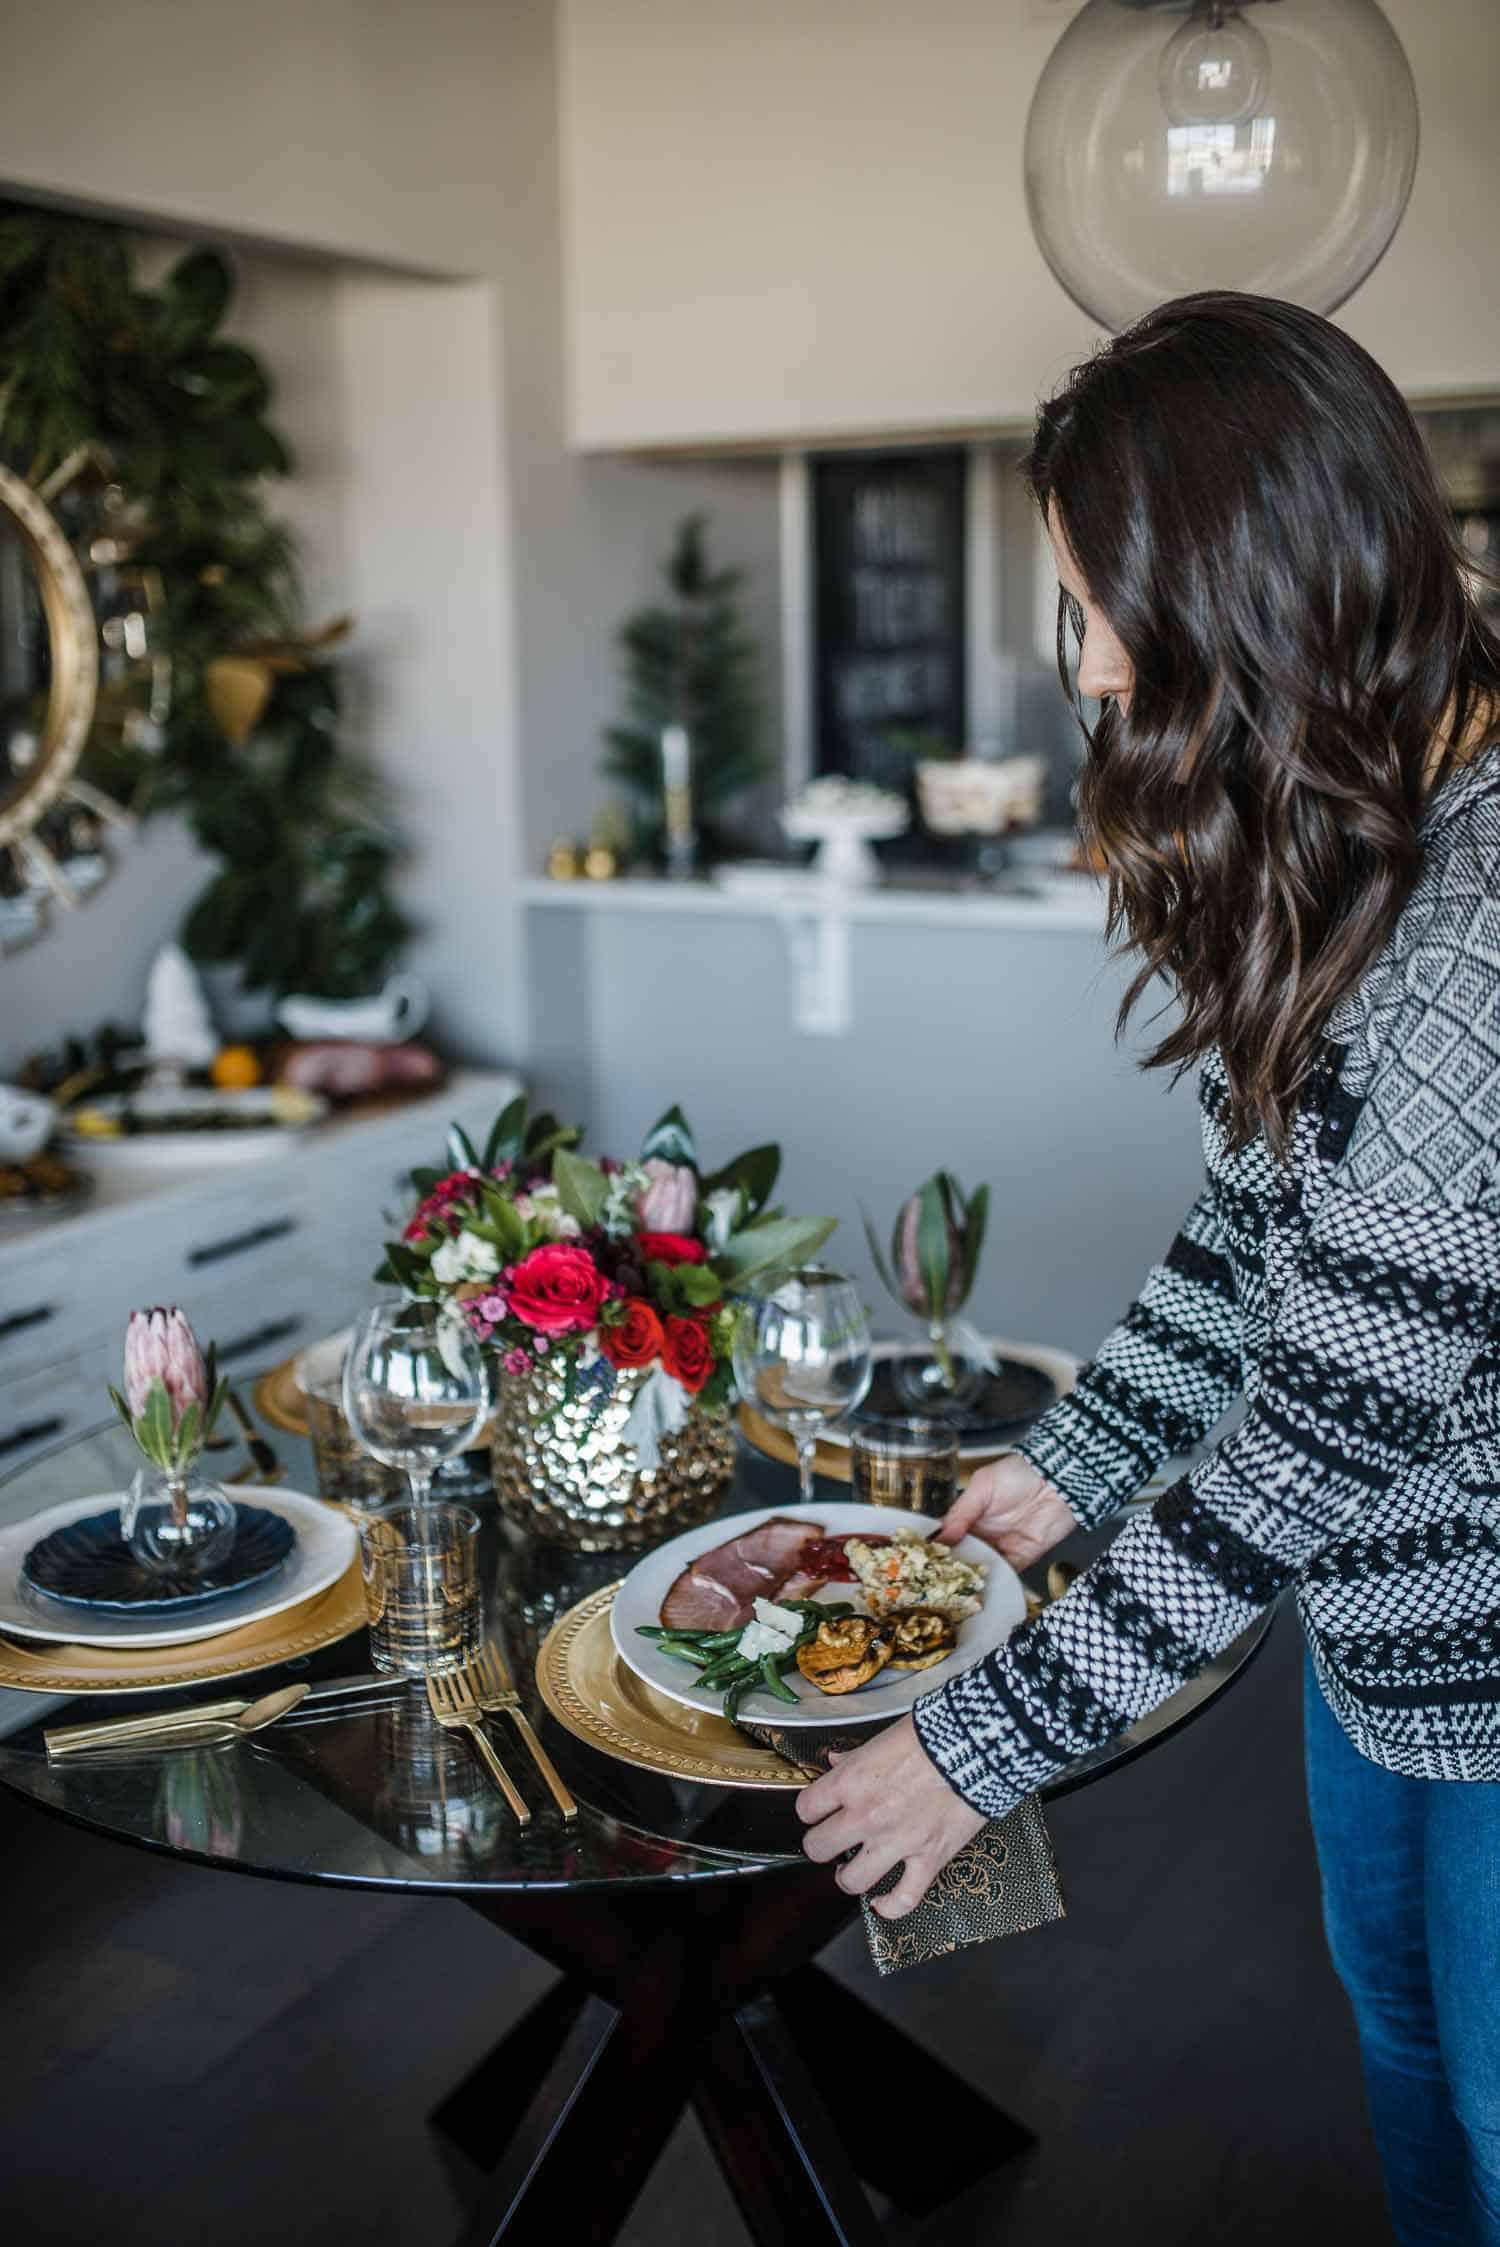 The Best Thanksgiving Buffet Tips - #dinnerplate #thanksgiving #holidays #entertaining